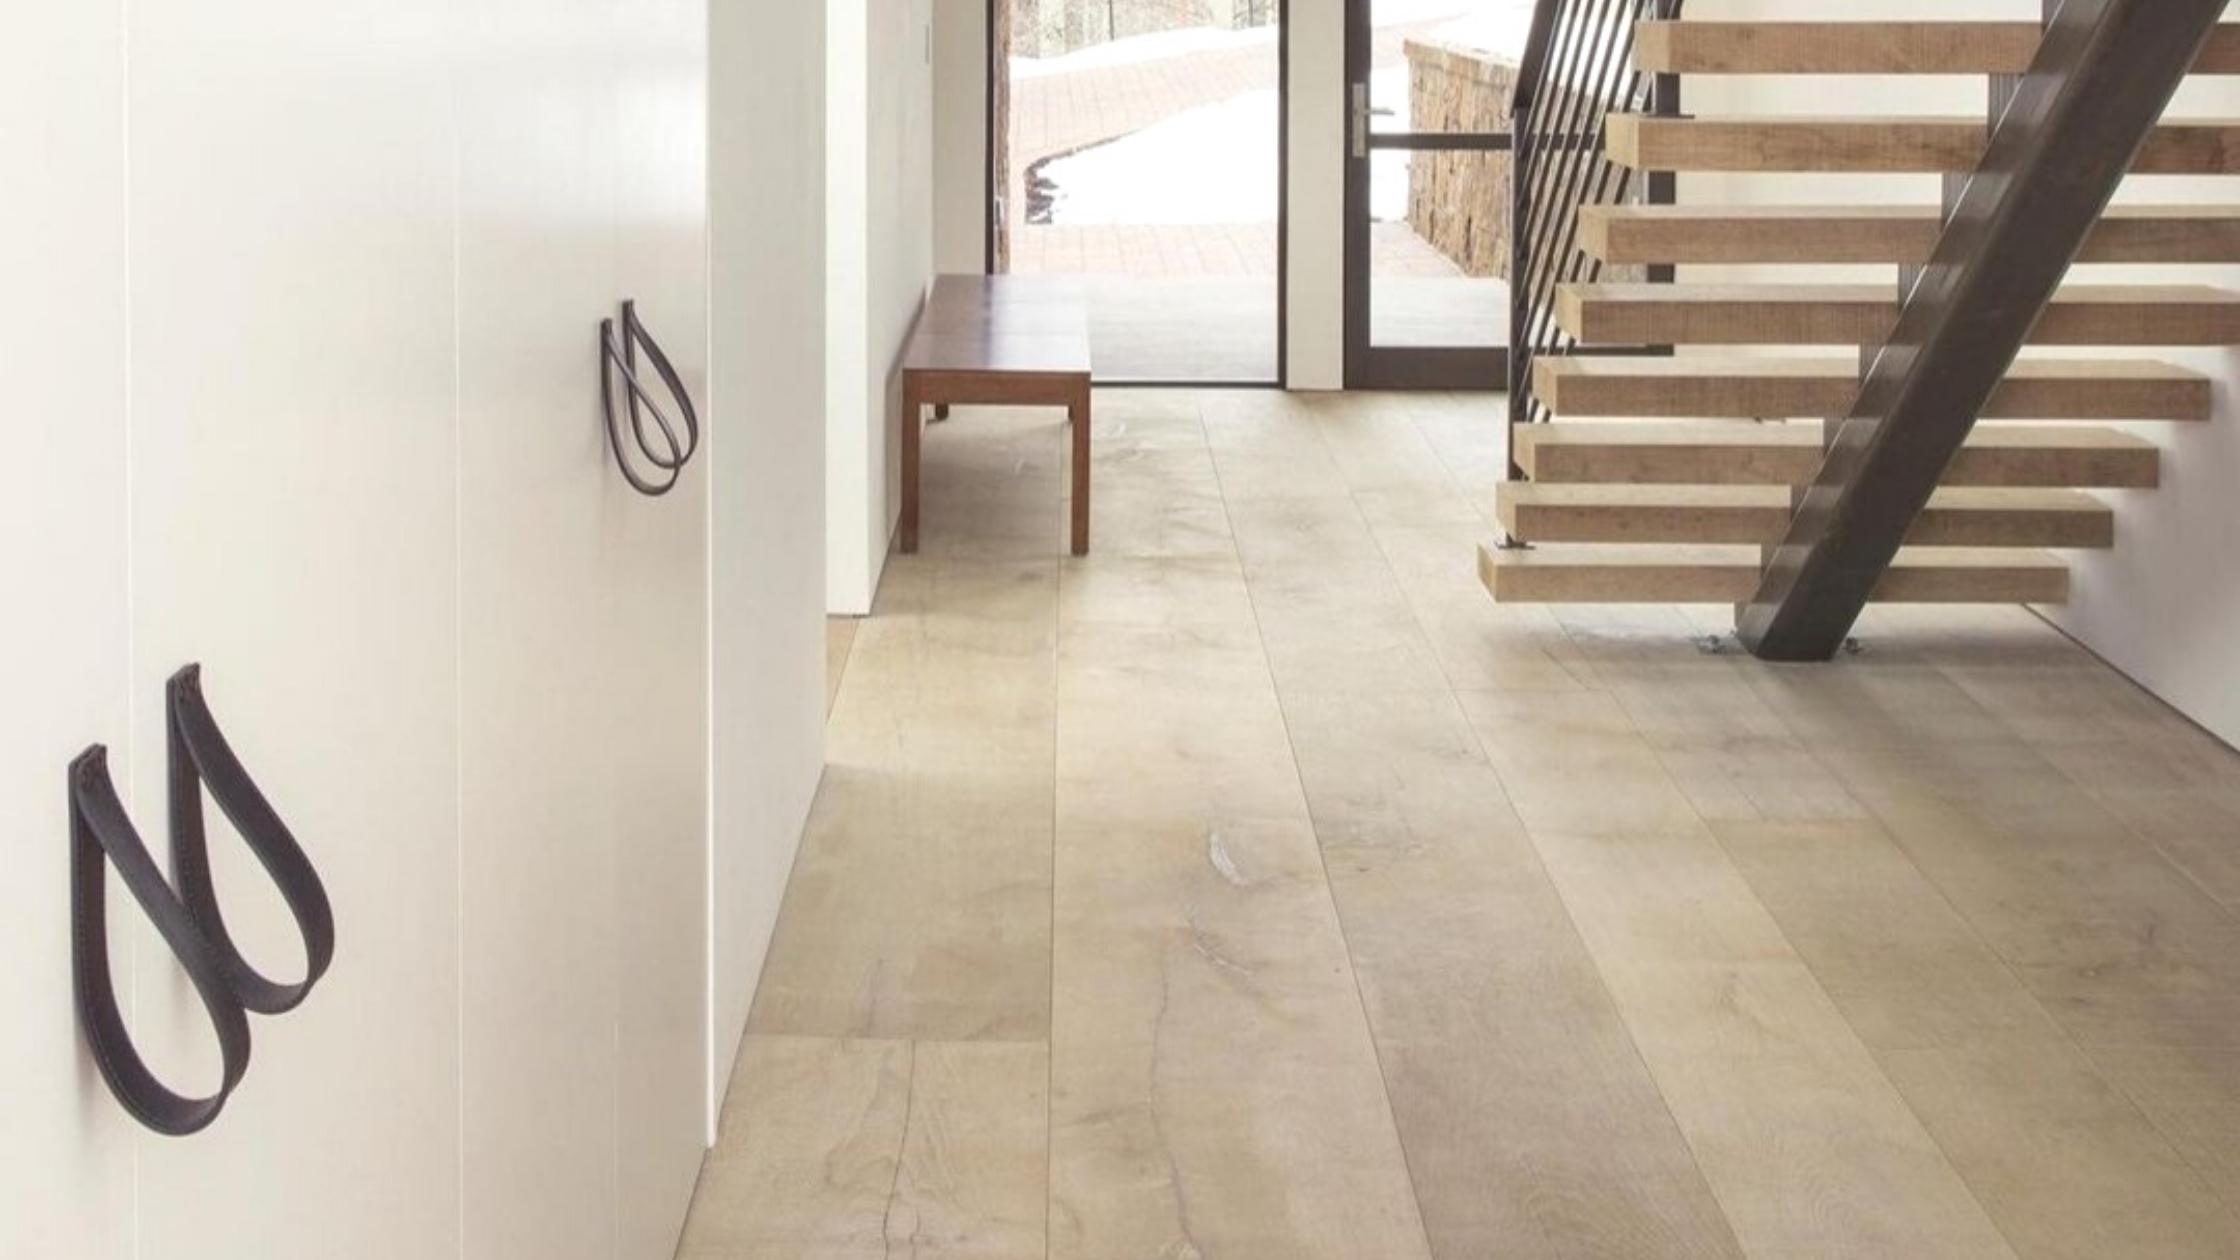 home renovations, hardwood floor, selling a home, Vaughan Realtor